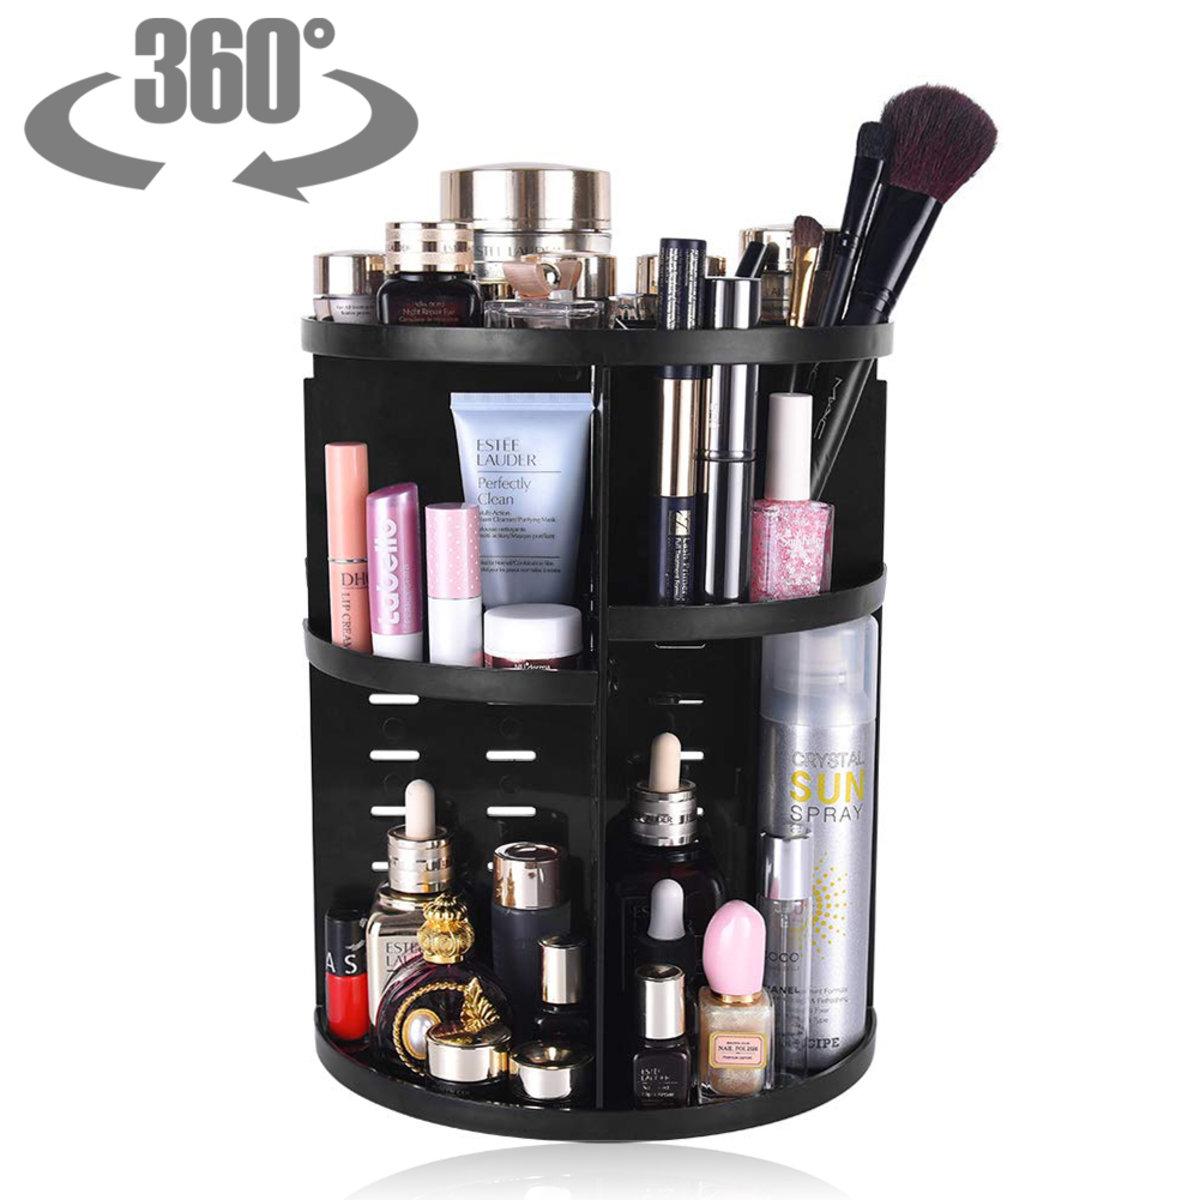 Makeup Organiser Rotating 360 Degree Adjustable Multi-Function Cream Brush Lipsticks Display Stand